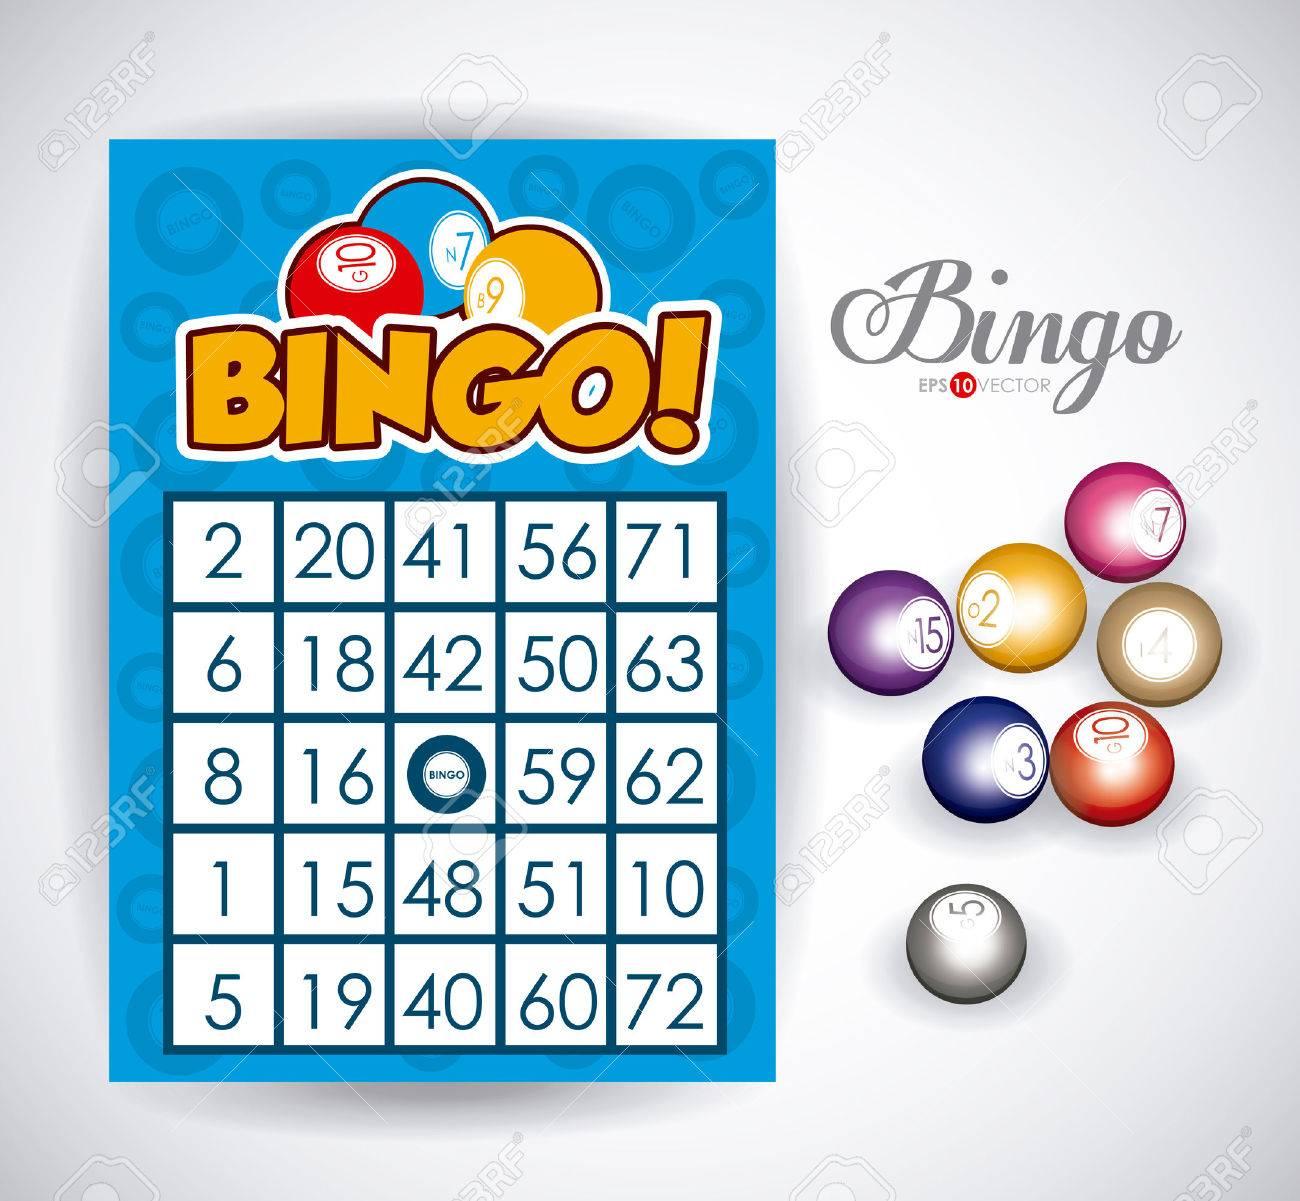 Bingo design over white background, vector illustration. - 36249994